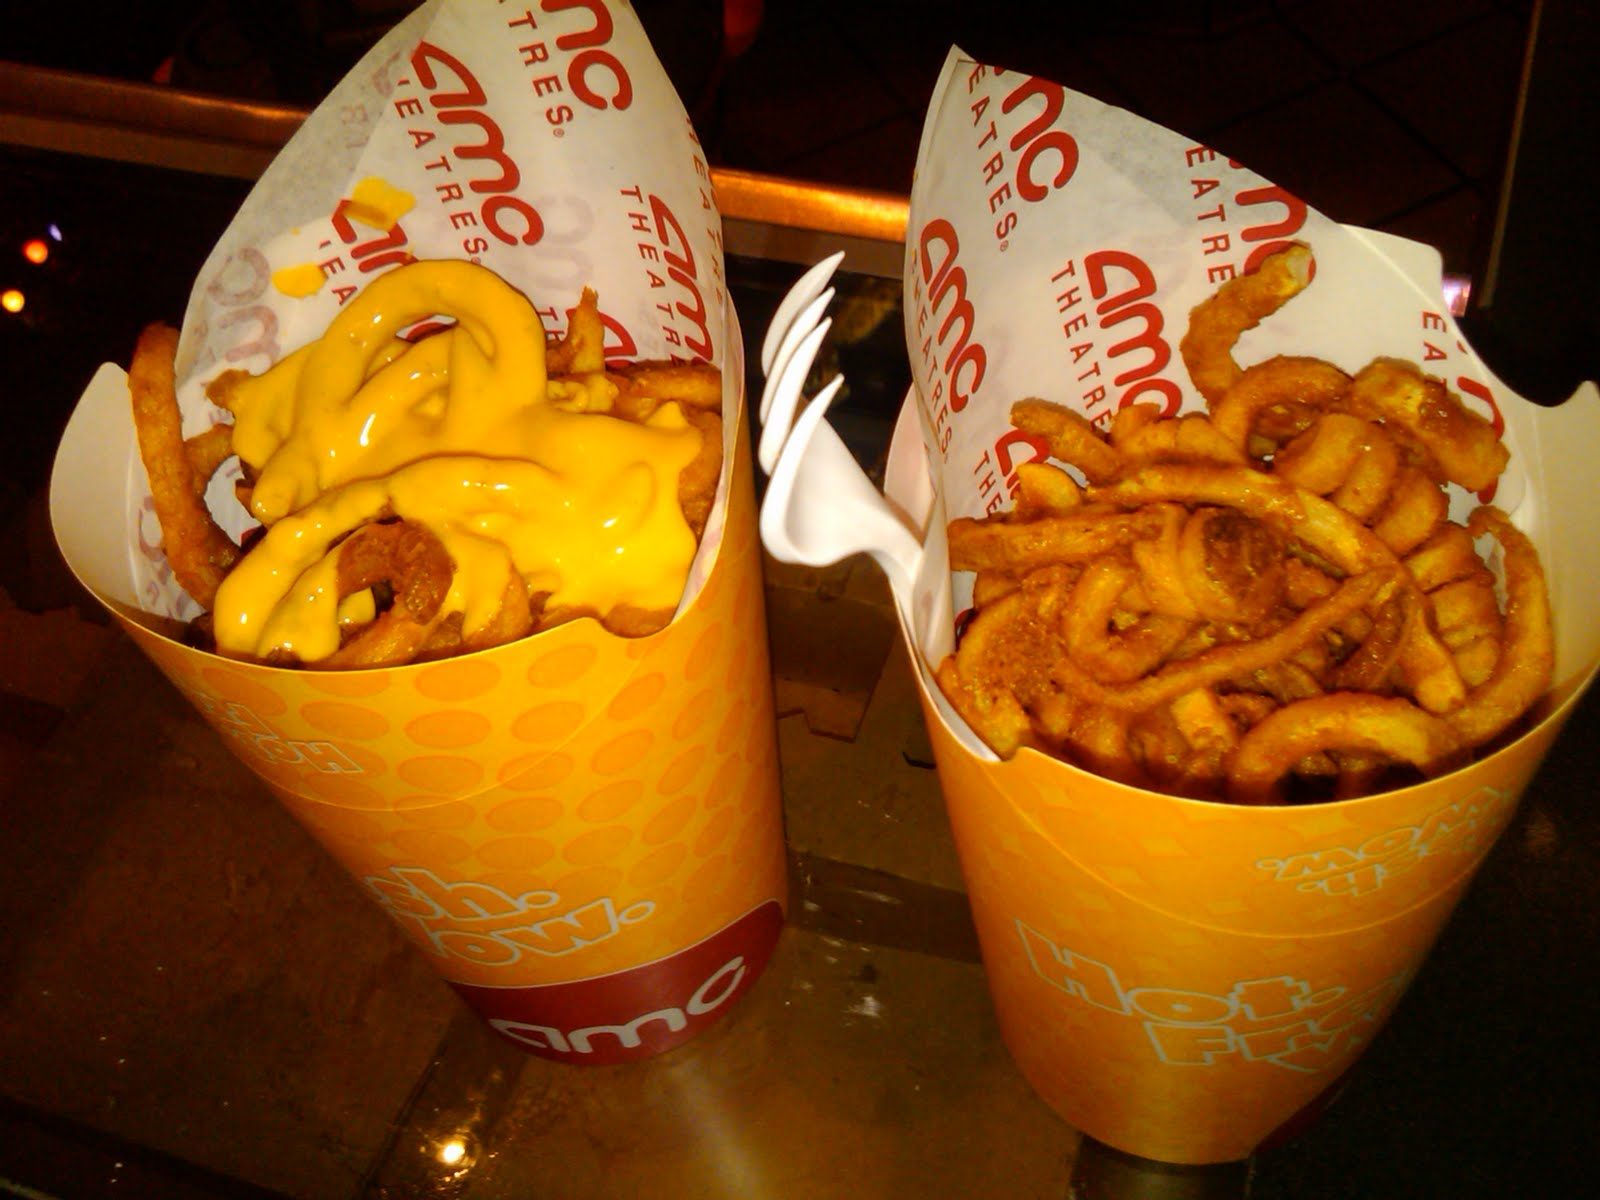 French Fry Diary French Fry Diary 134 Loews Amc Cinema Cherry Hill Nj